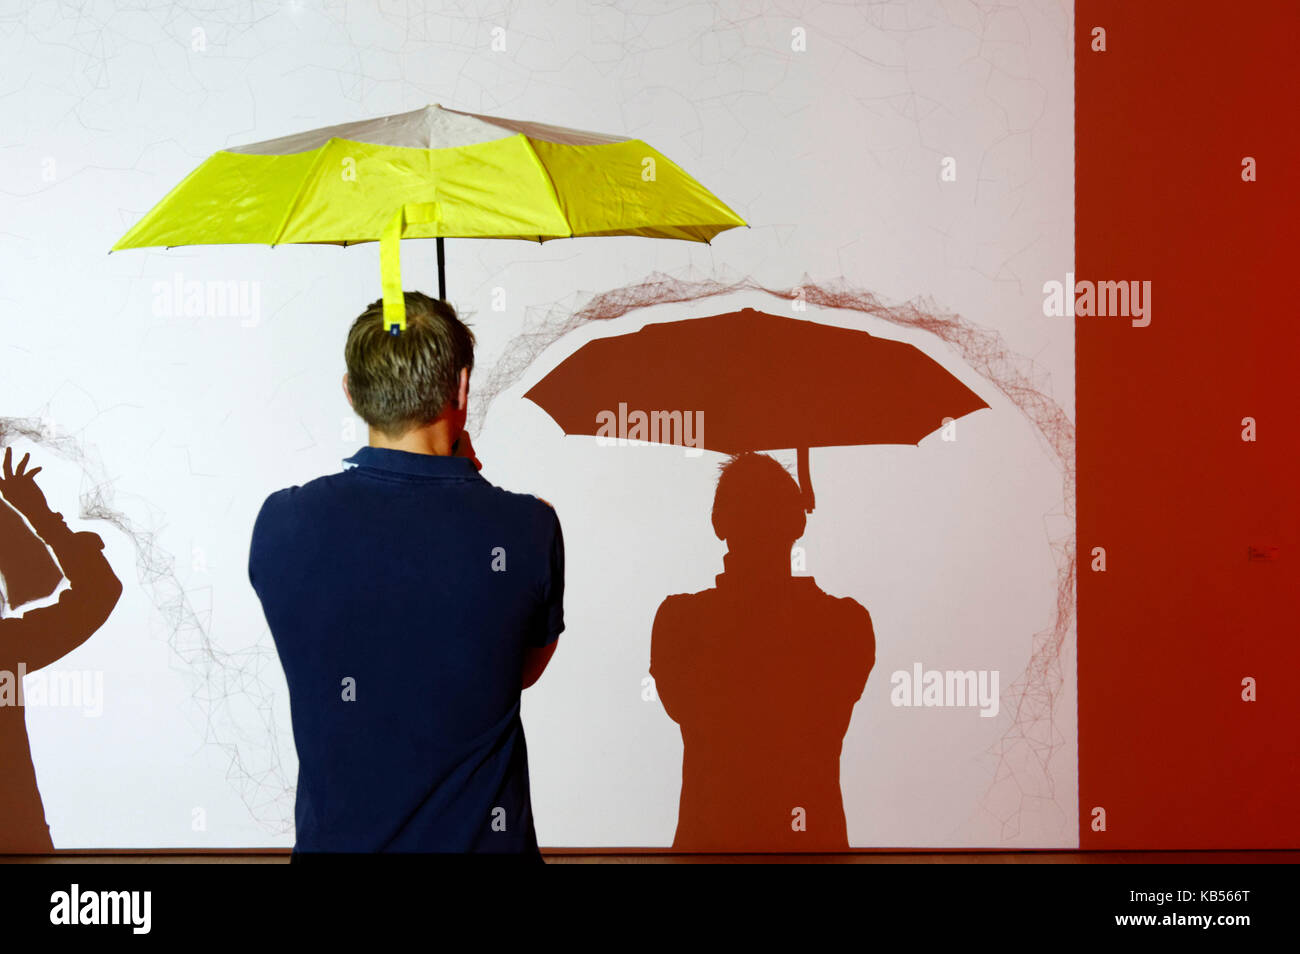 United Kingdom, London, Chelsea, Saatchi Gallery, Proximity / repulsion interactive projection, Felix Bonowski - Stock Image